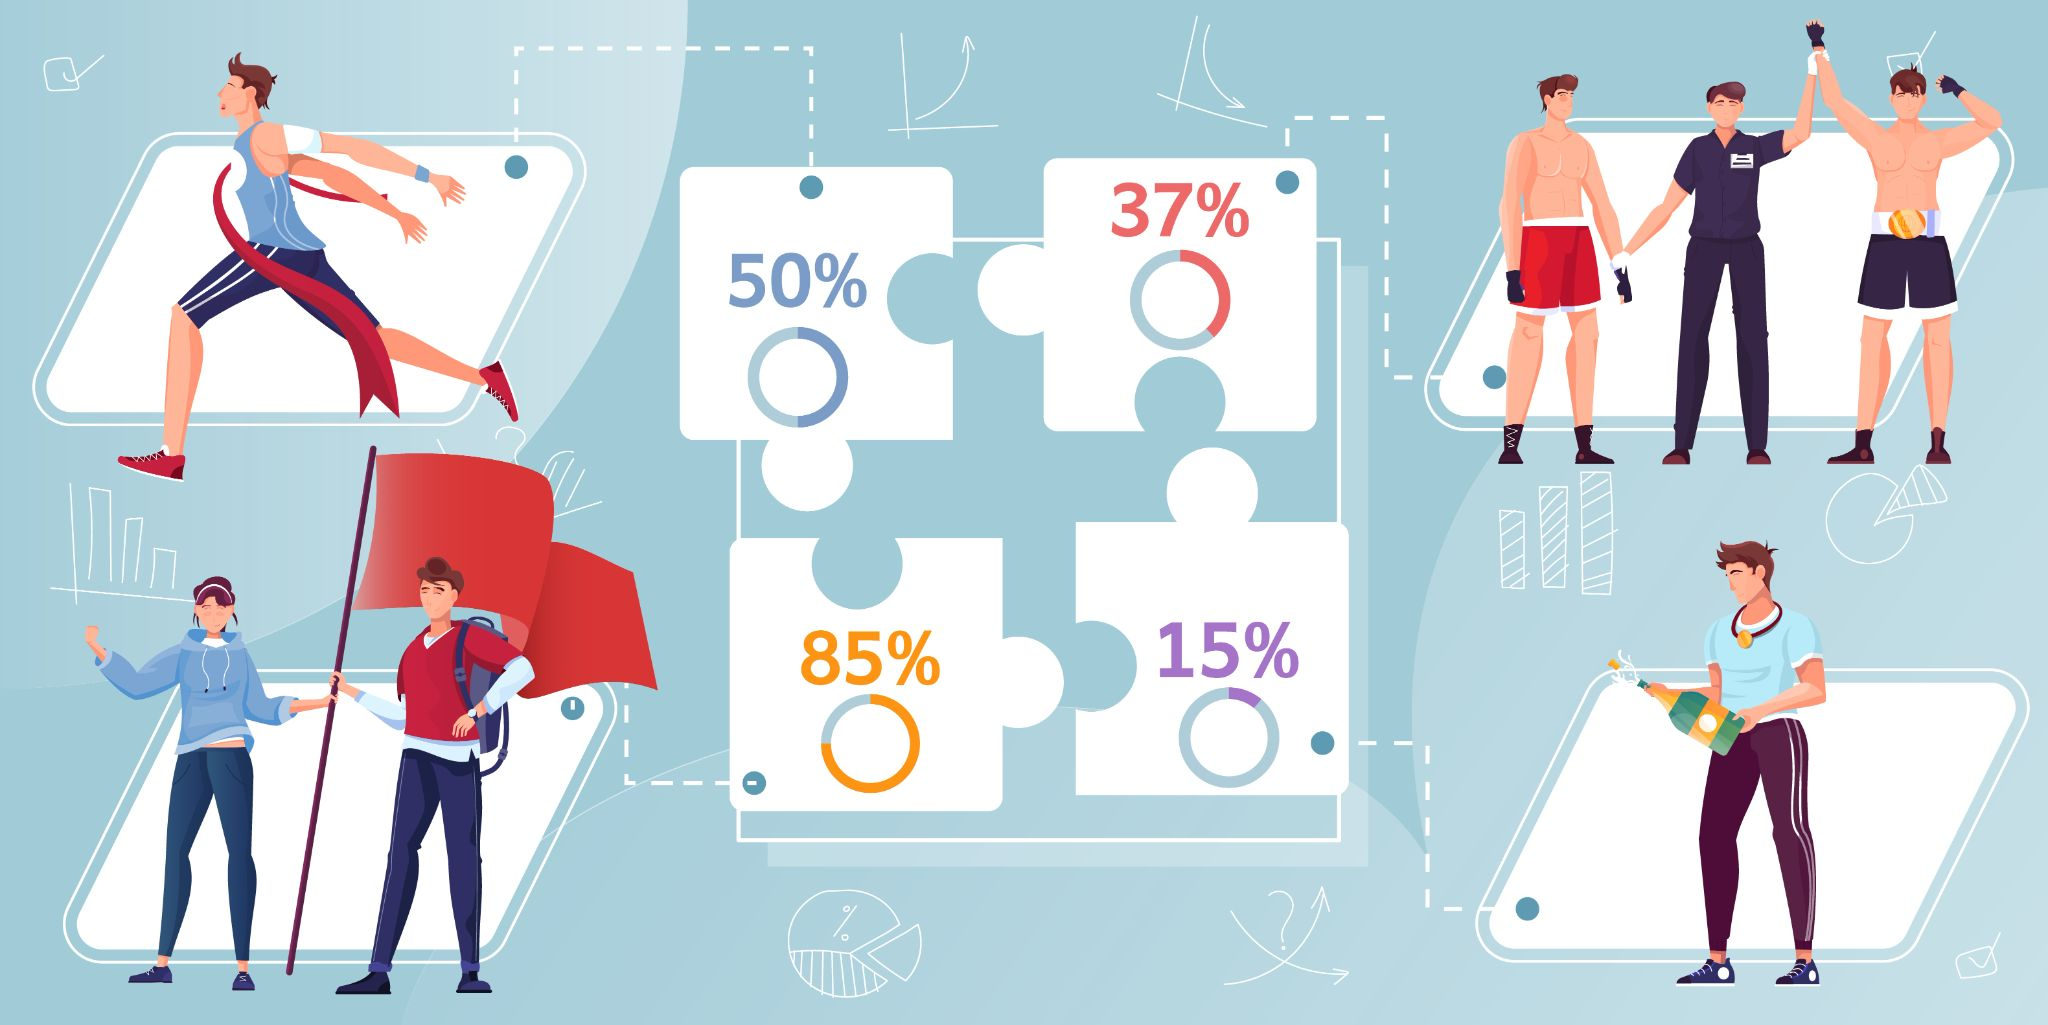 Data analysis helps in Increasing the player's efficiency.